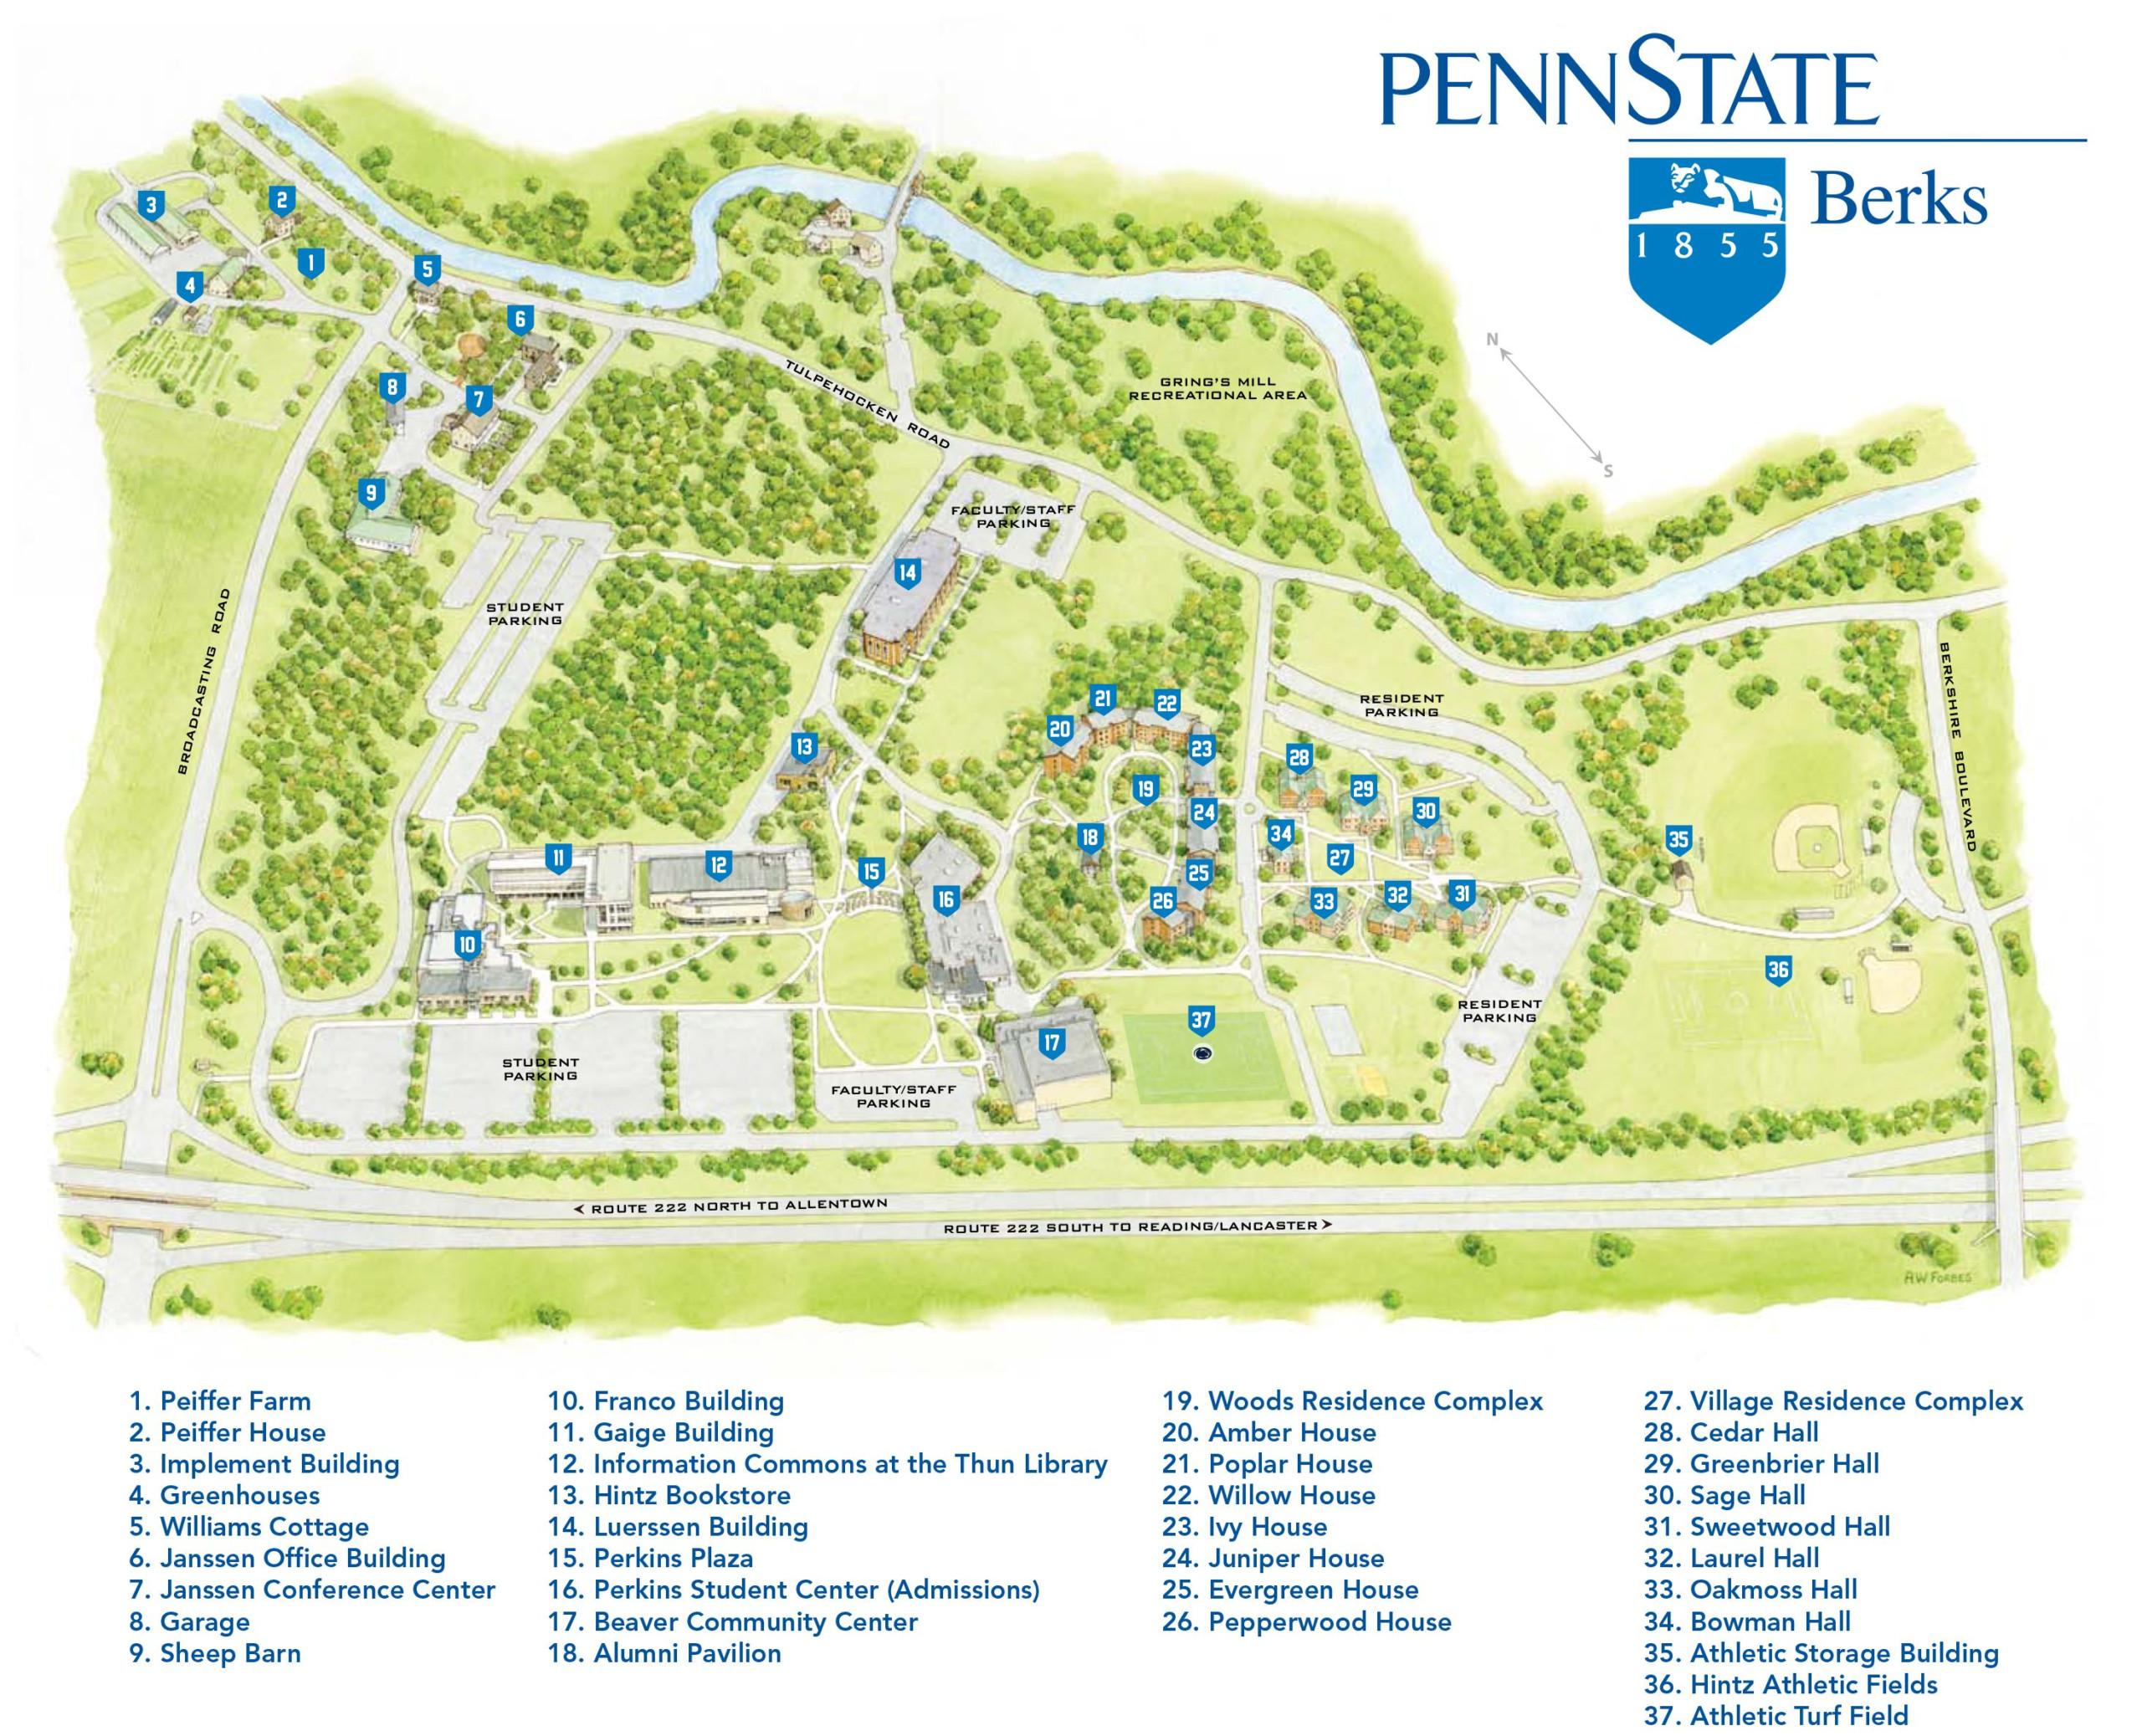 Printable Map Of The Penn State Berks Campus Http bk